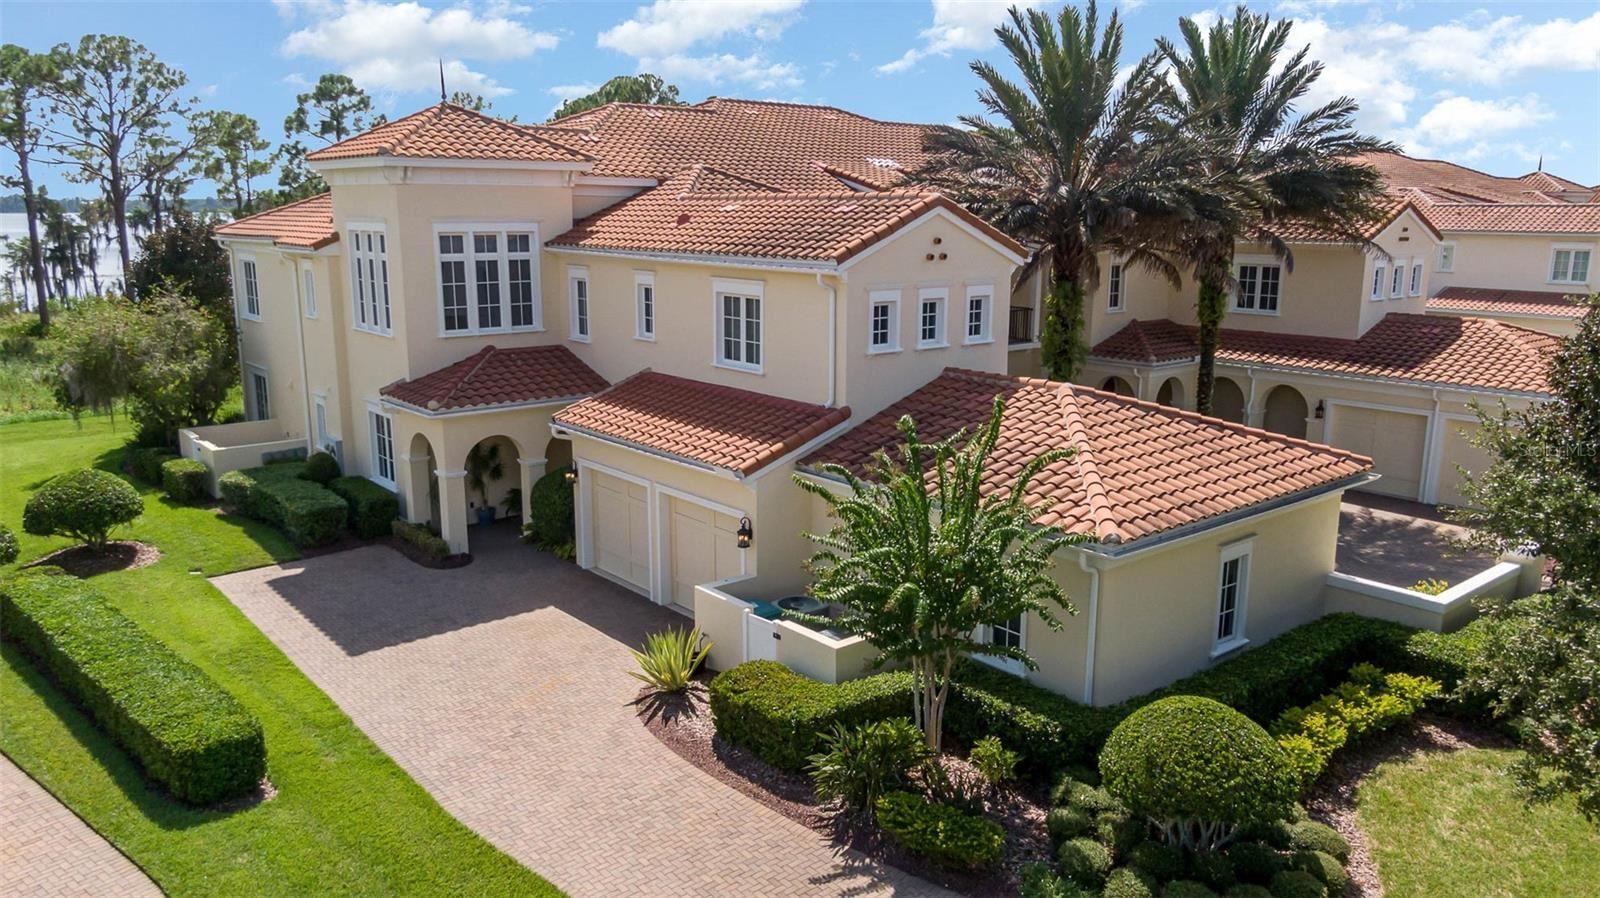 10355 KENSINGTON SHORE DRIVE, Orlando, FL 32827 - #: O5970060